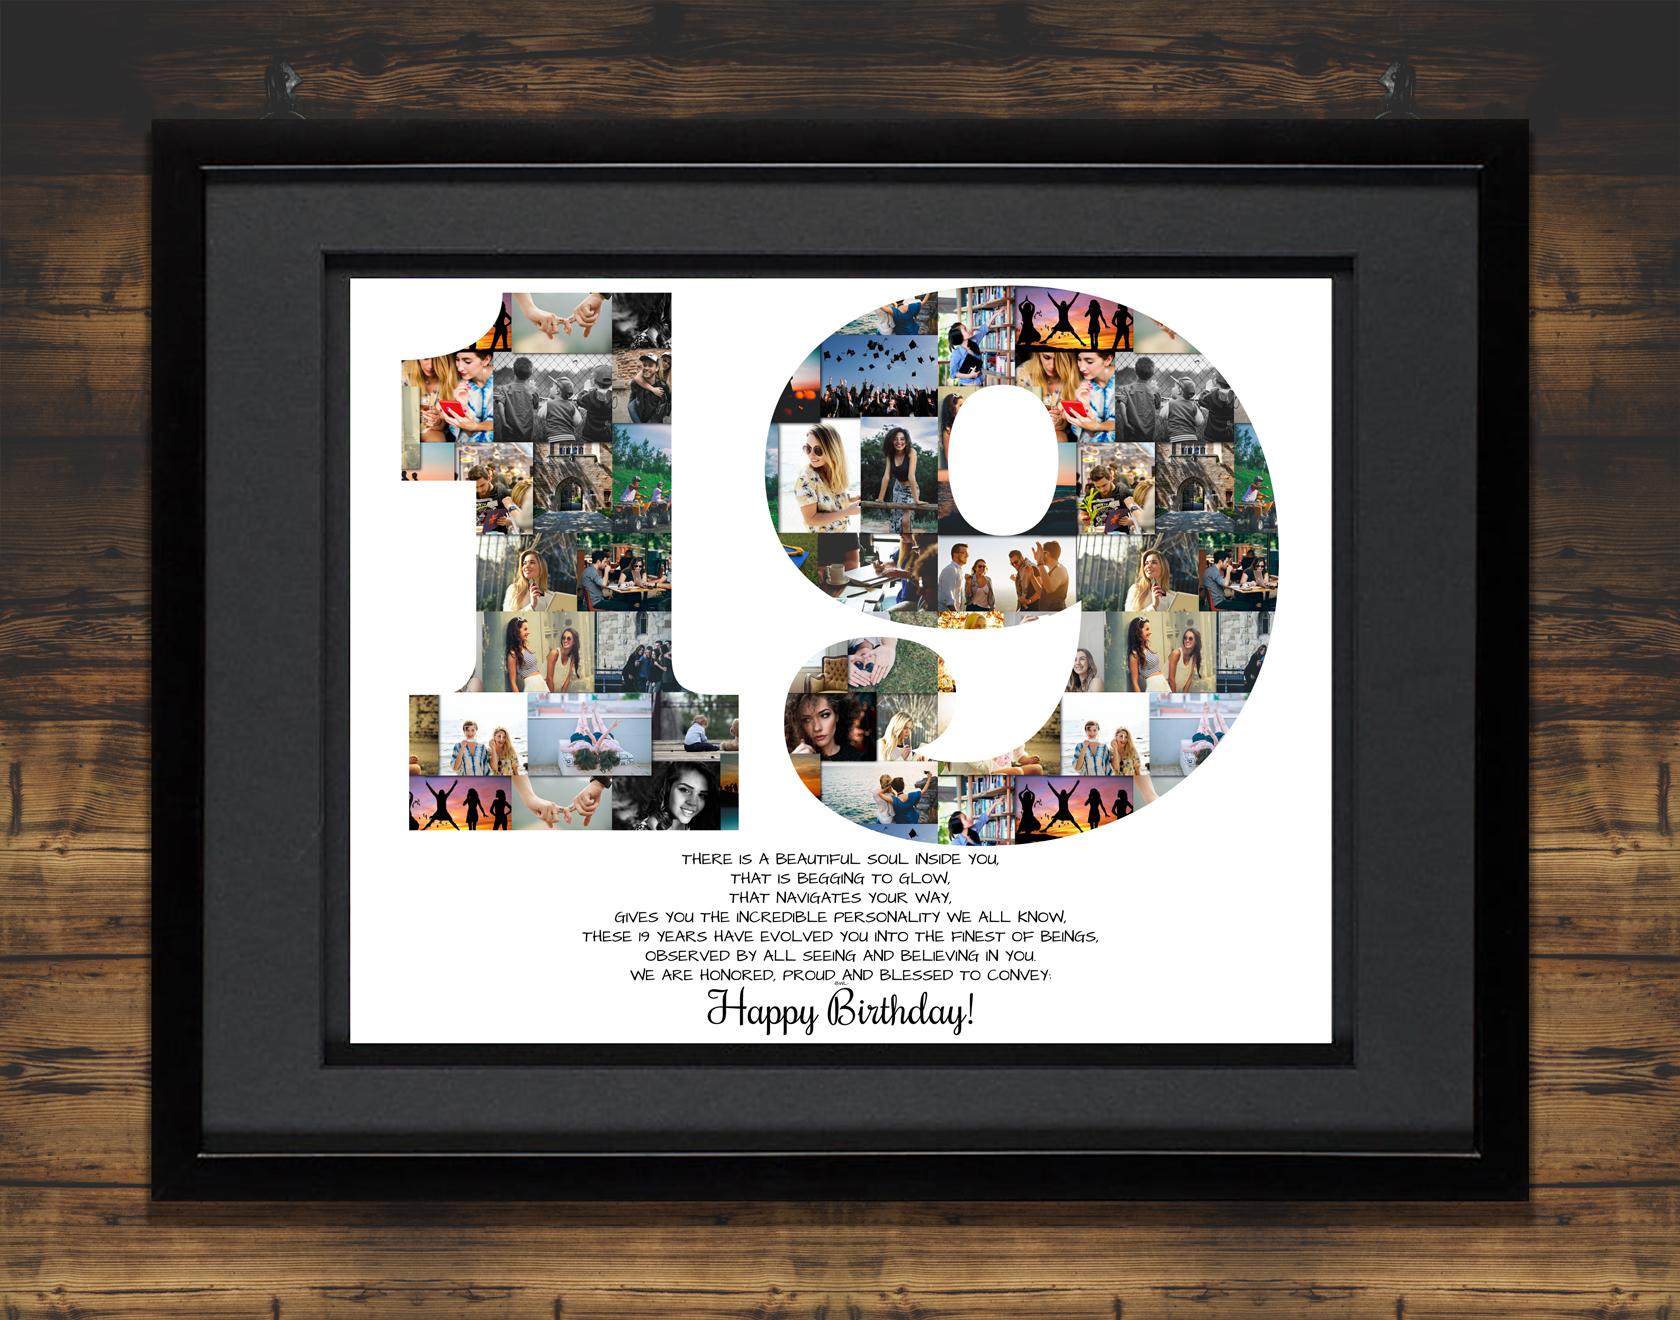 19th Birthday Photo Collage Gift Milestone Premium Hand Crafted Artsy